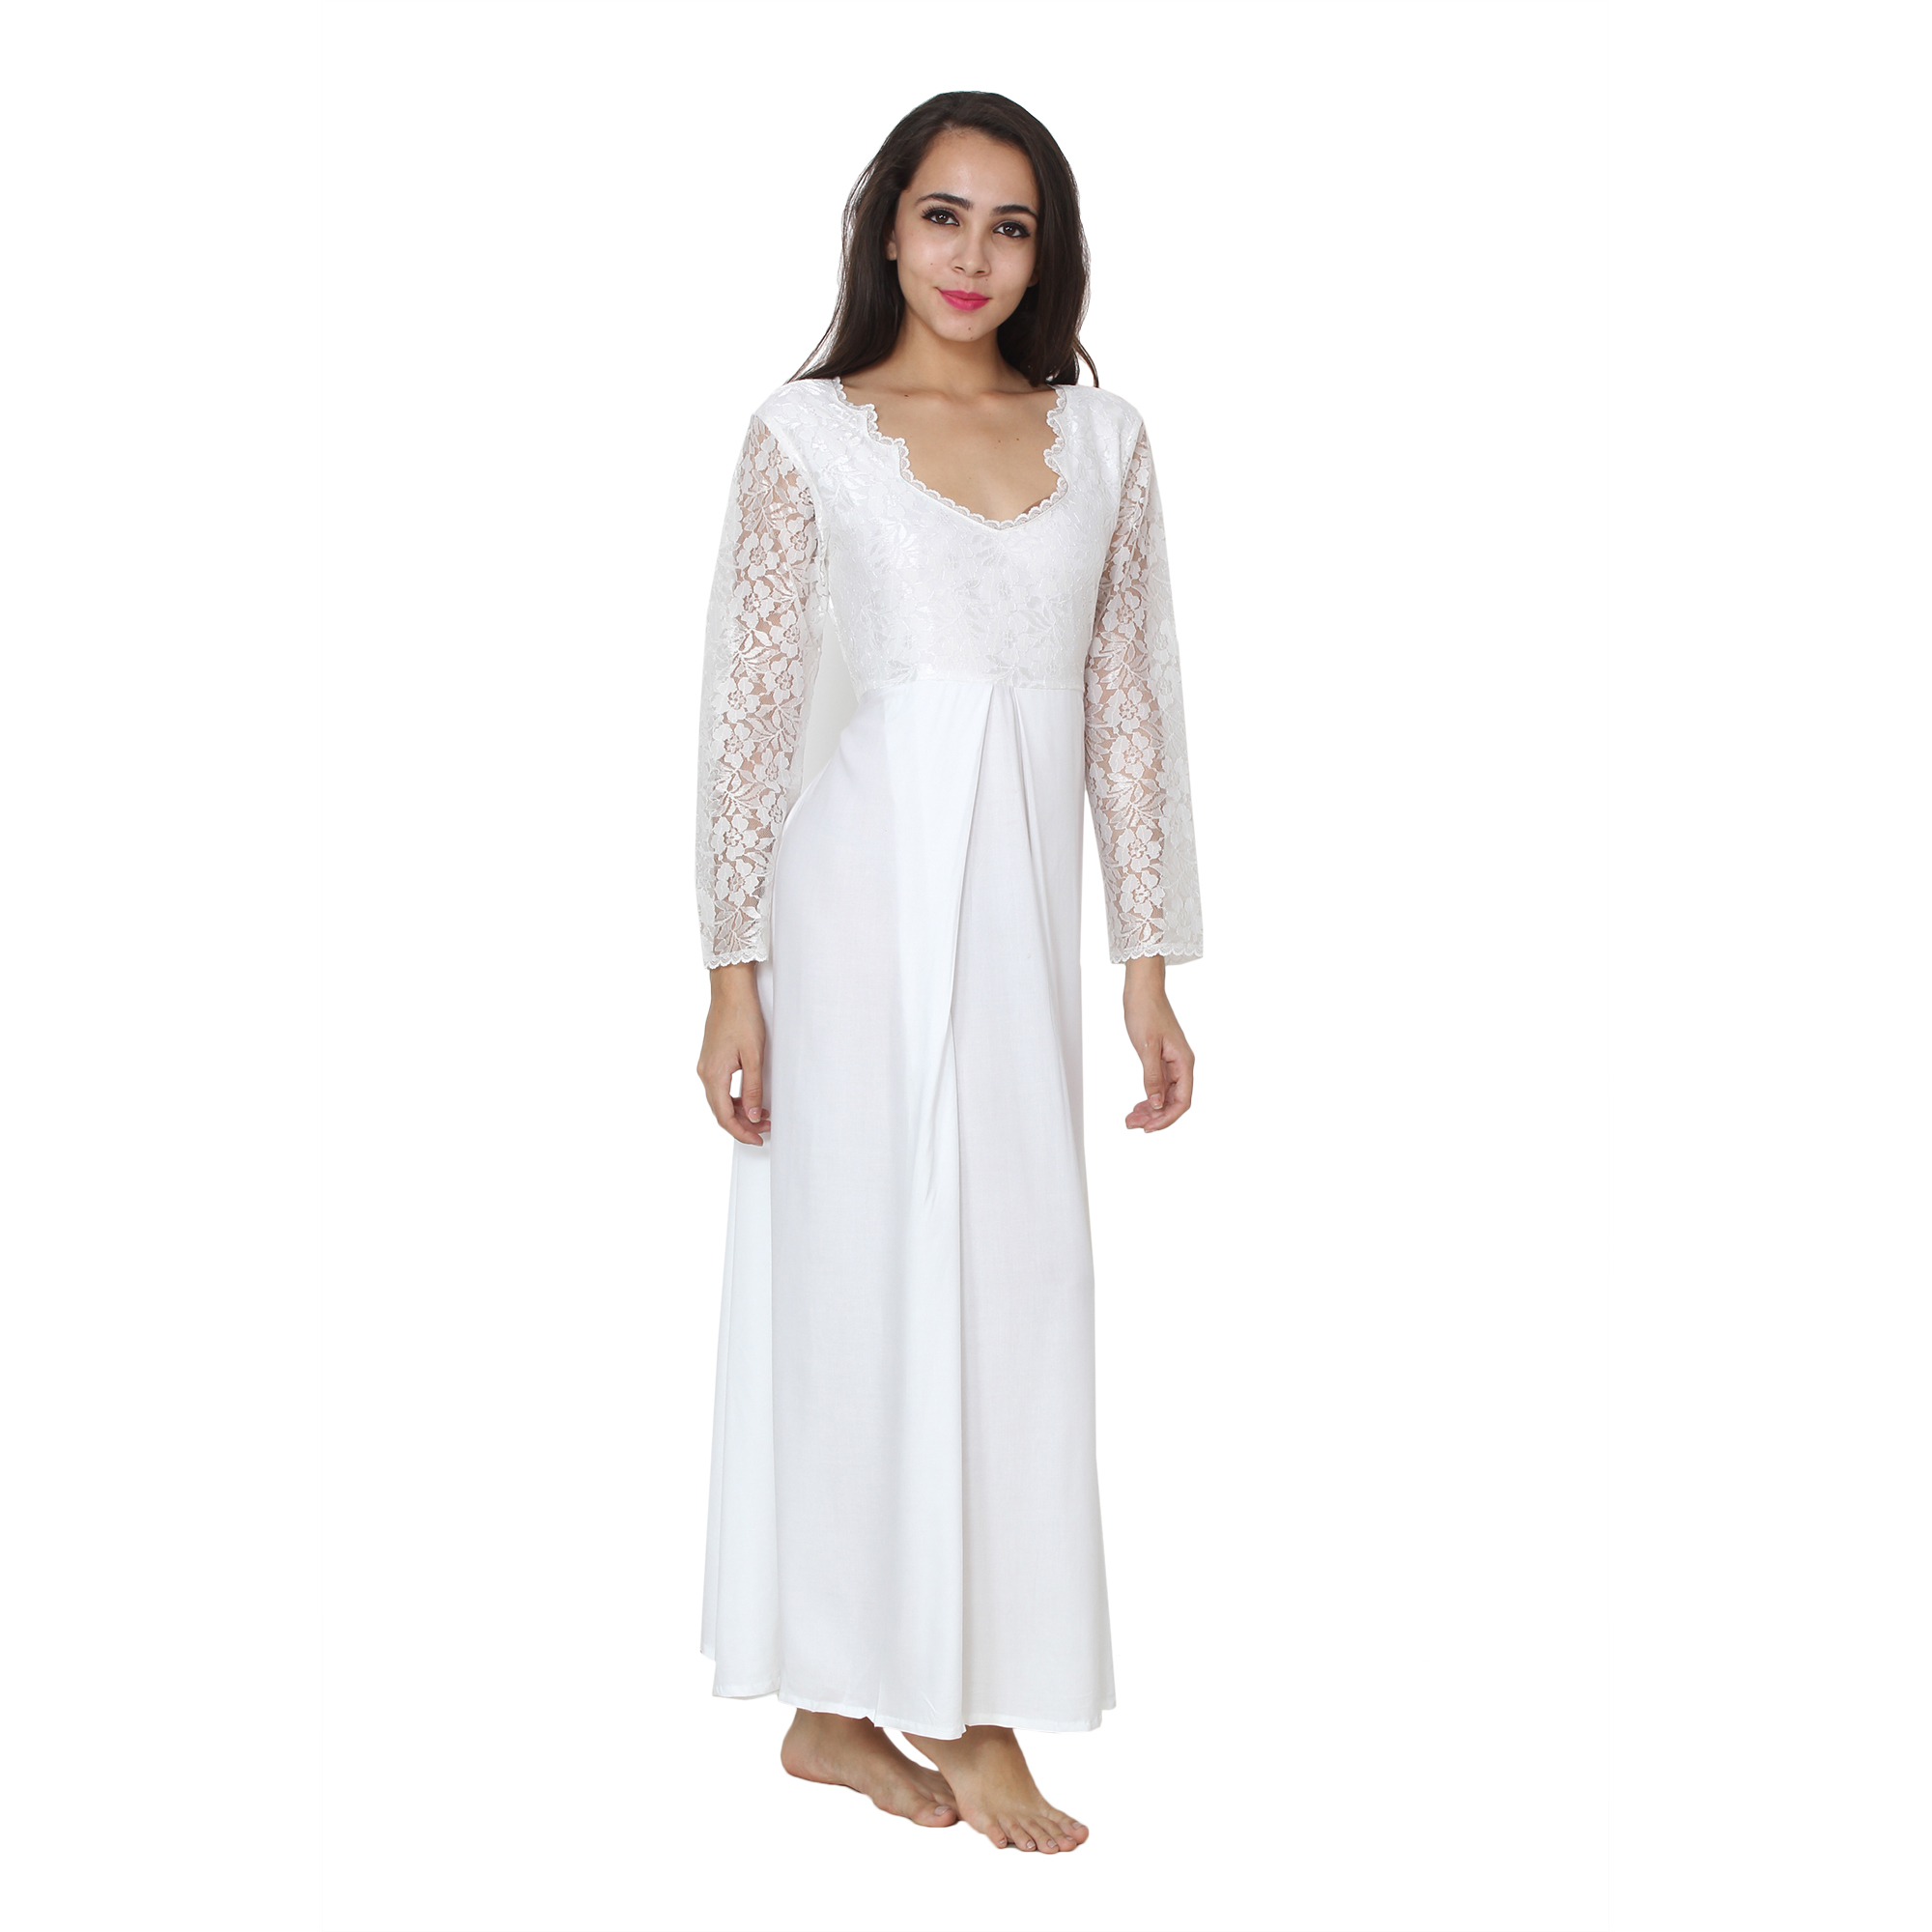 Smock Style Lace Blouson Maxi Nightdress cum Dress in White